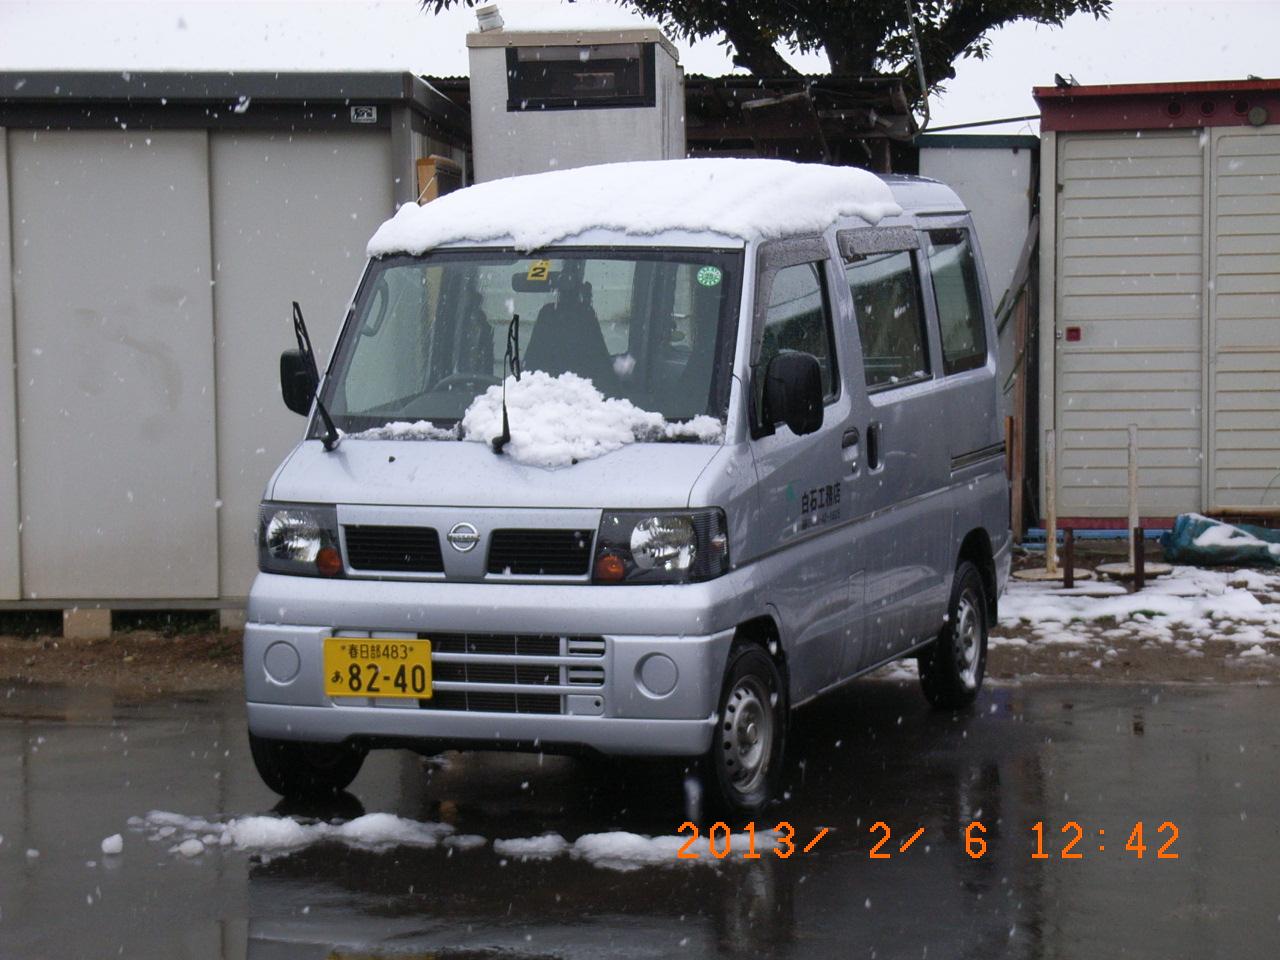 RIMG0643.JPG